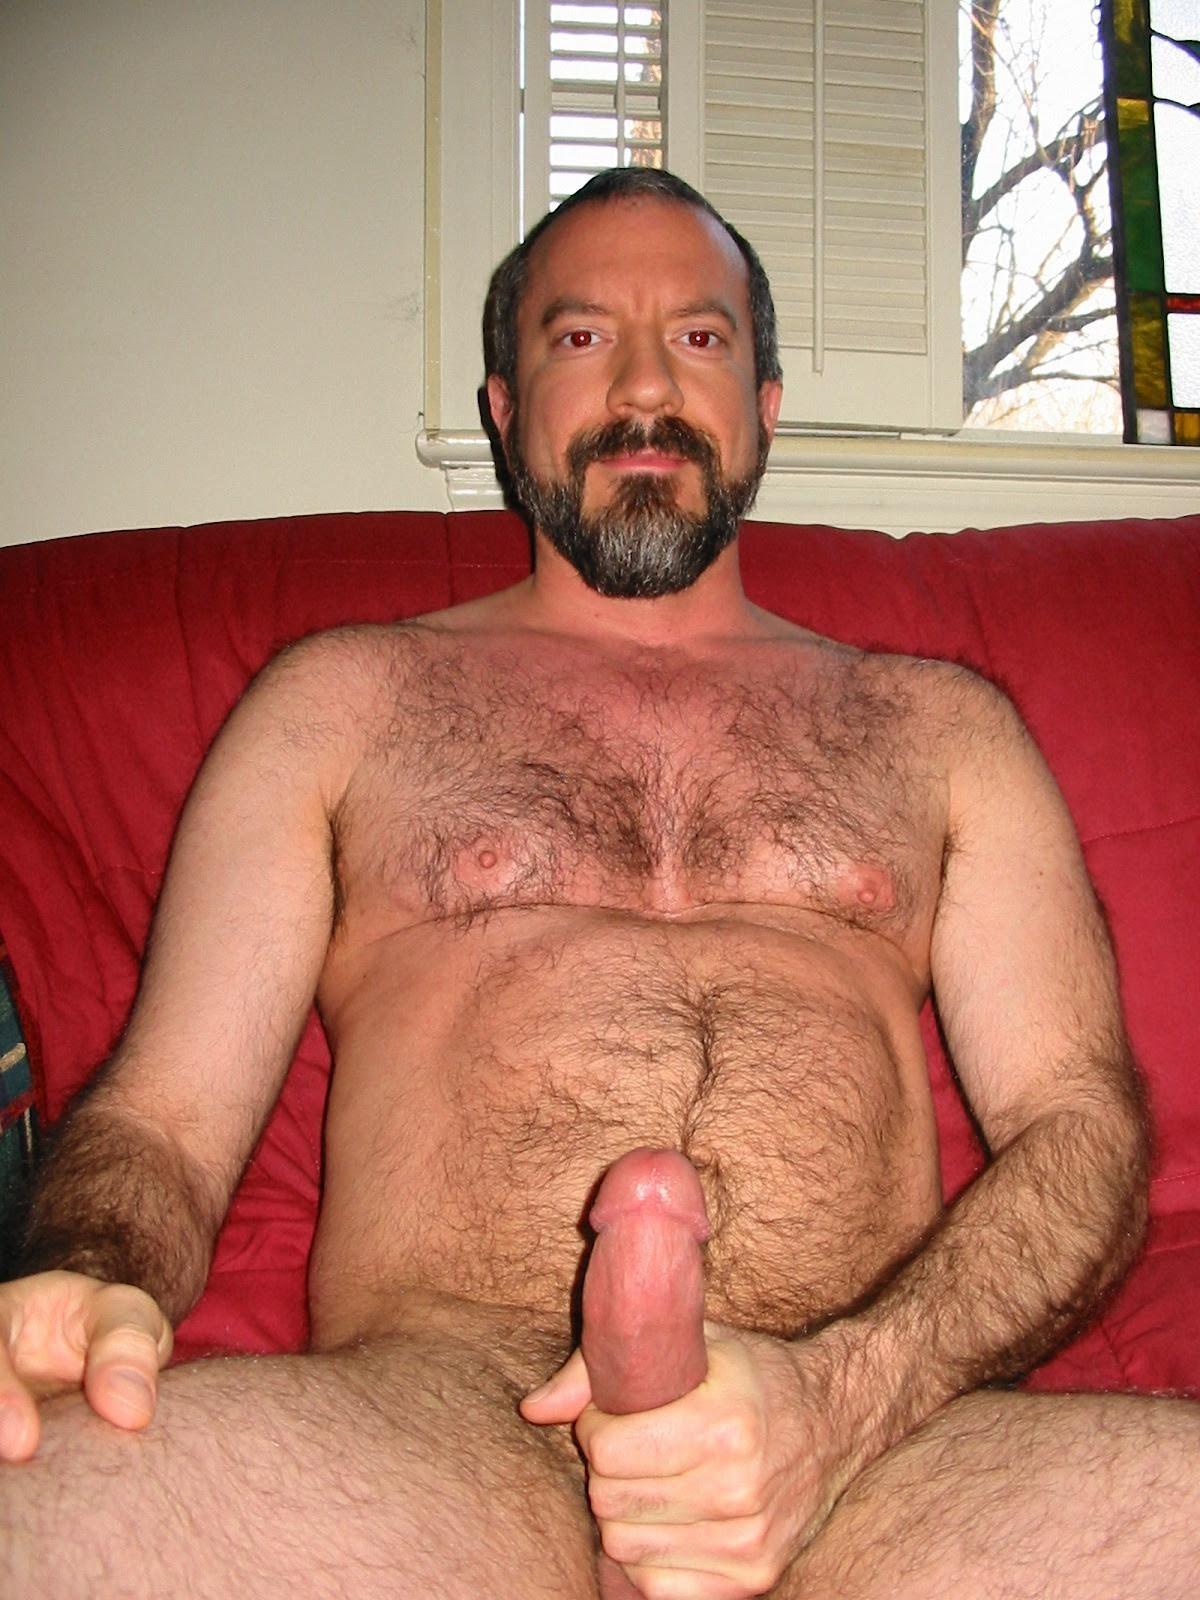 Daddyswap